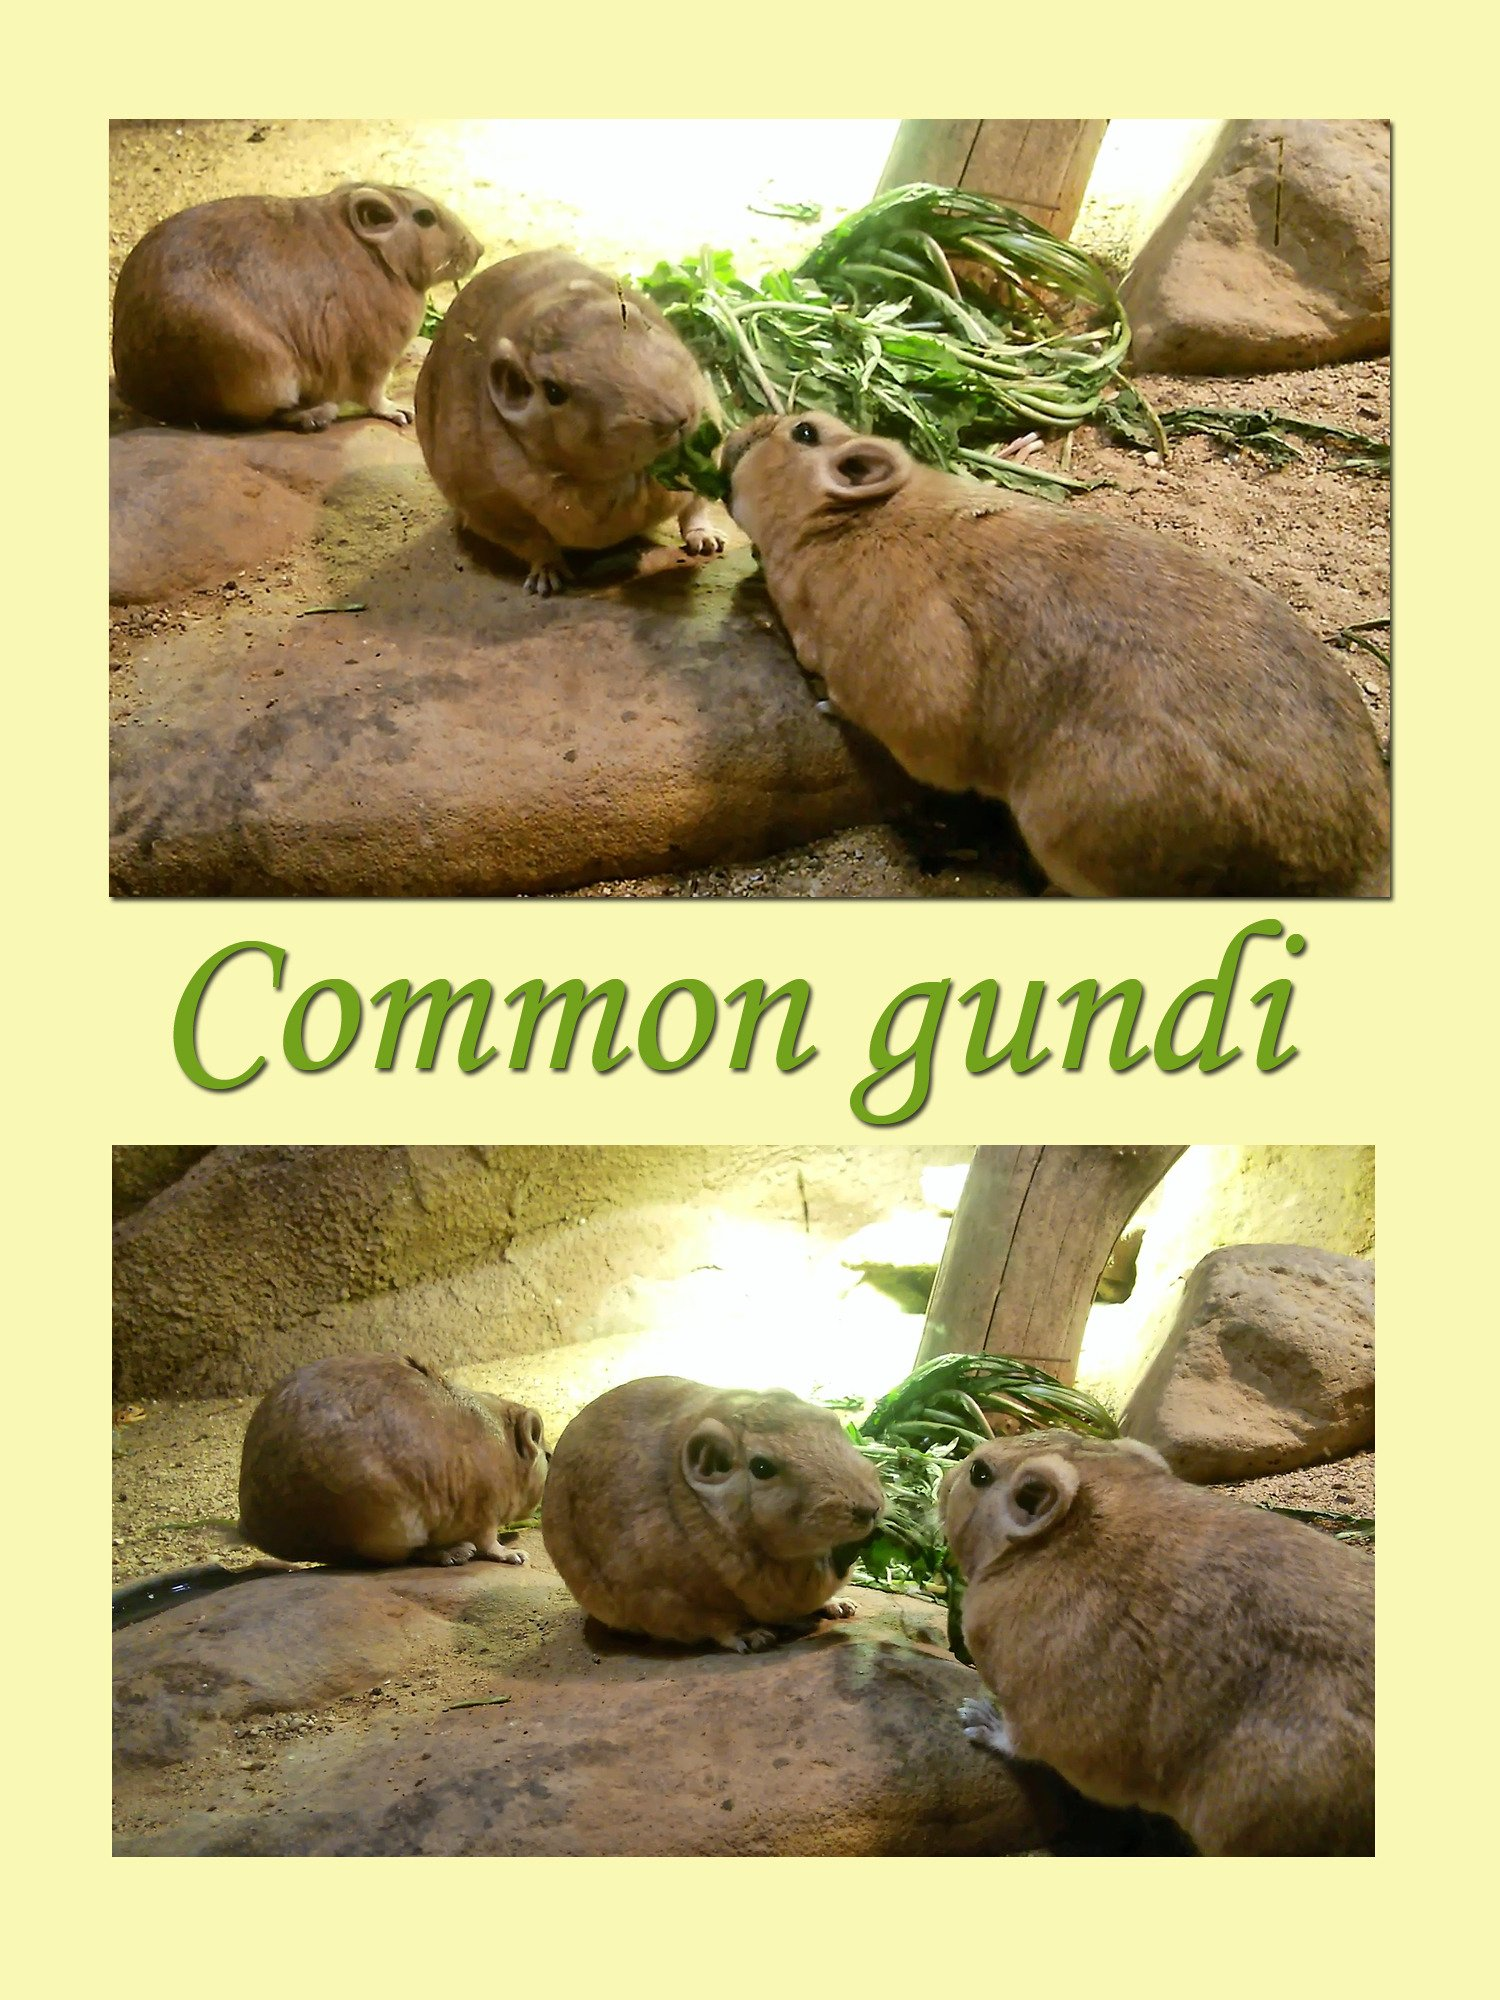 Clip: Common gundi